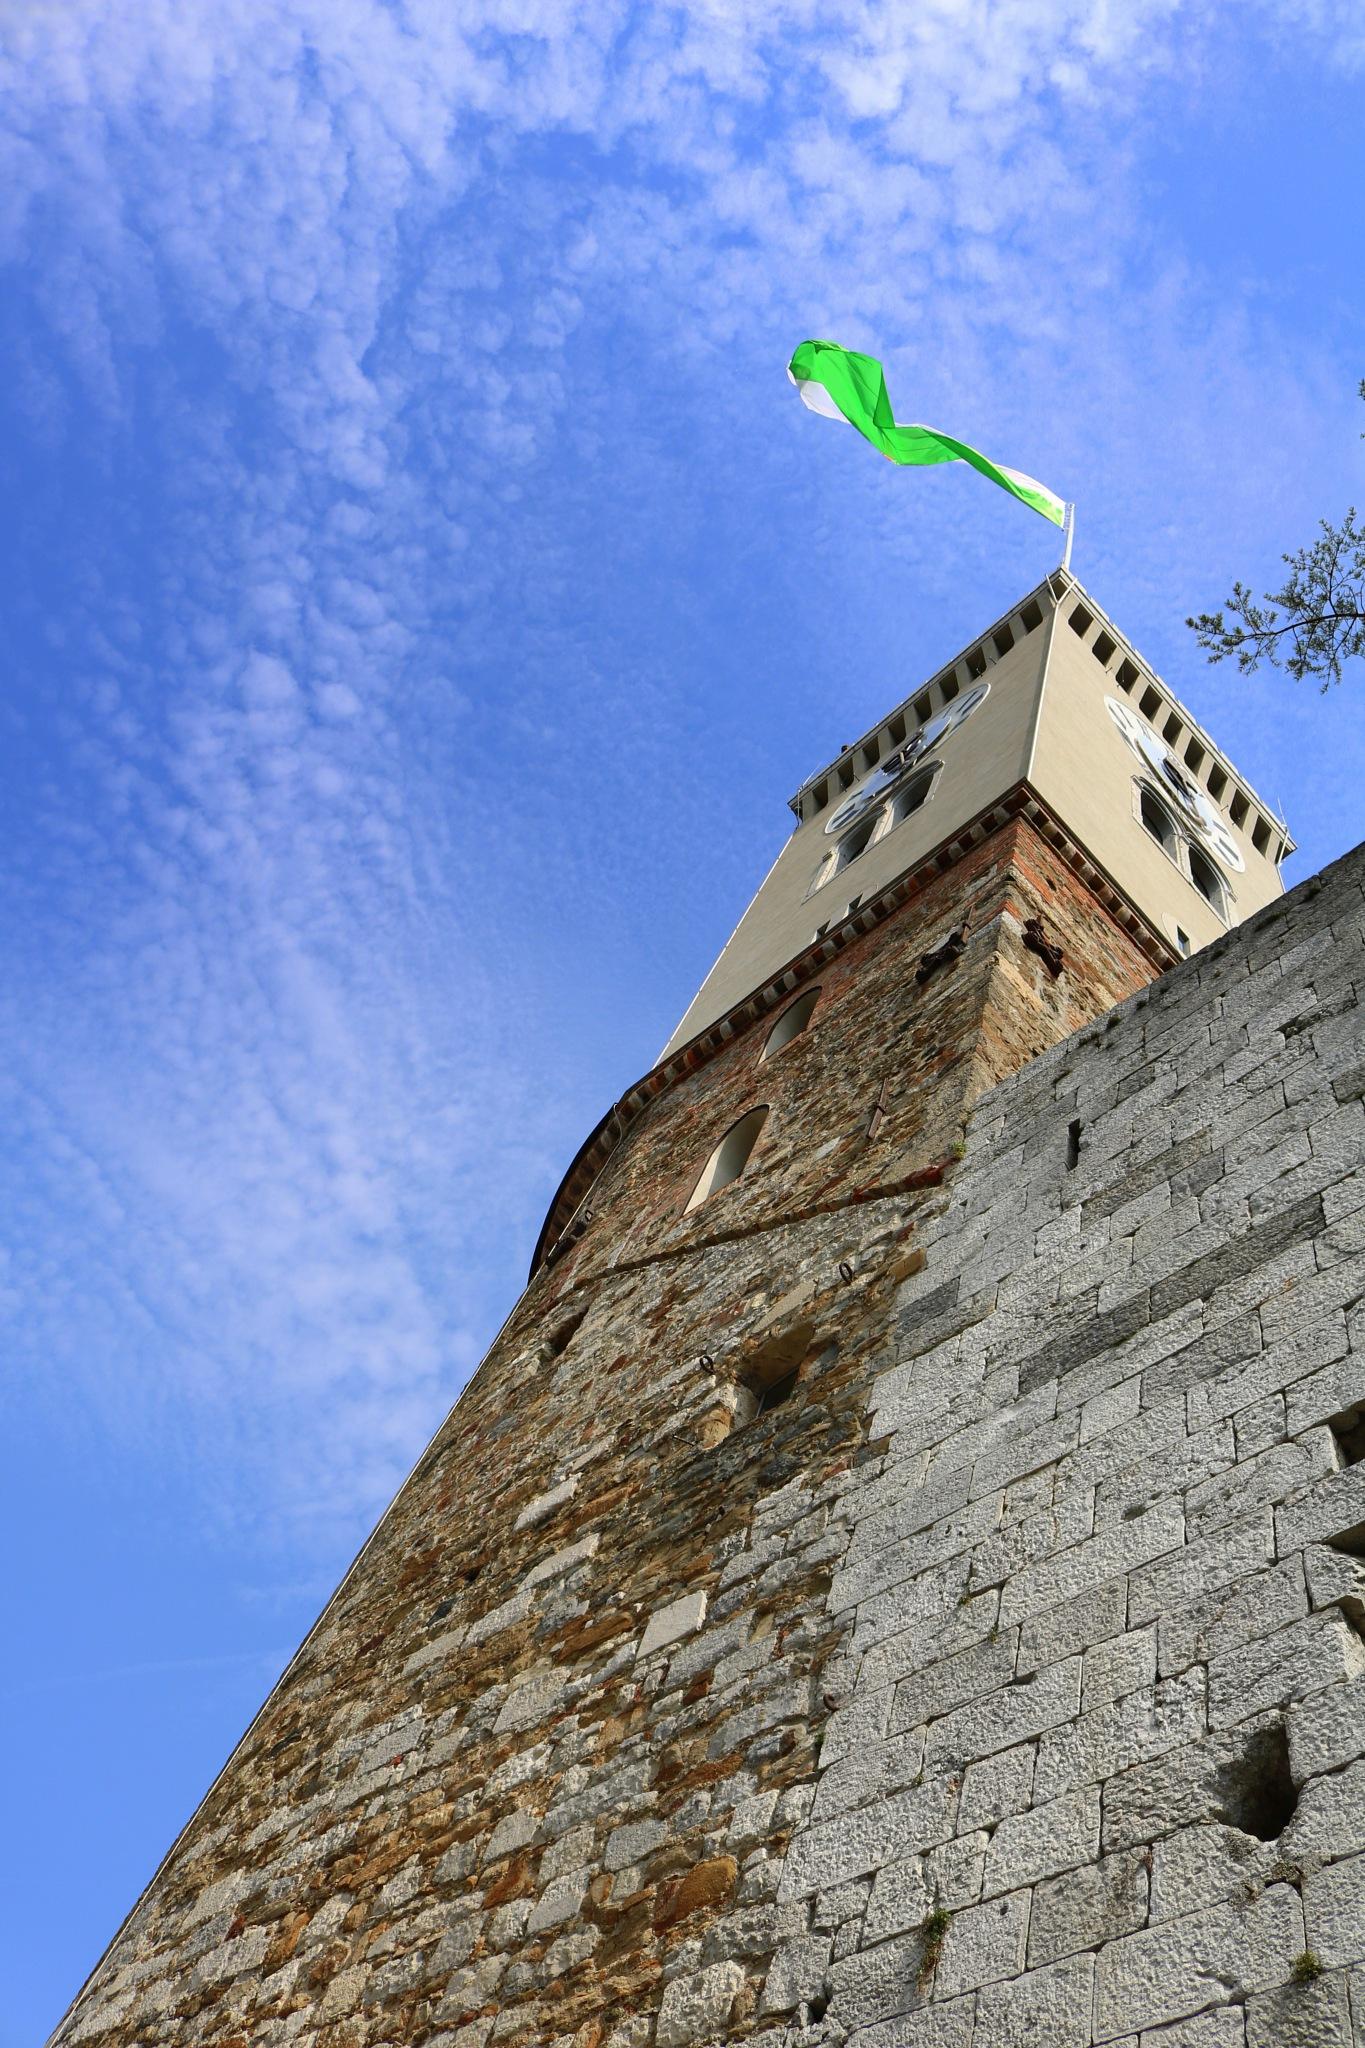 Ljubljana castle, Slovenia by zvnktomasevic